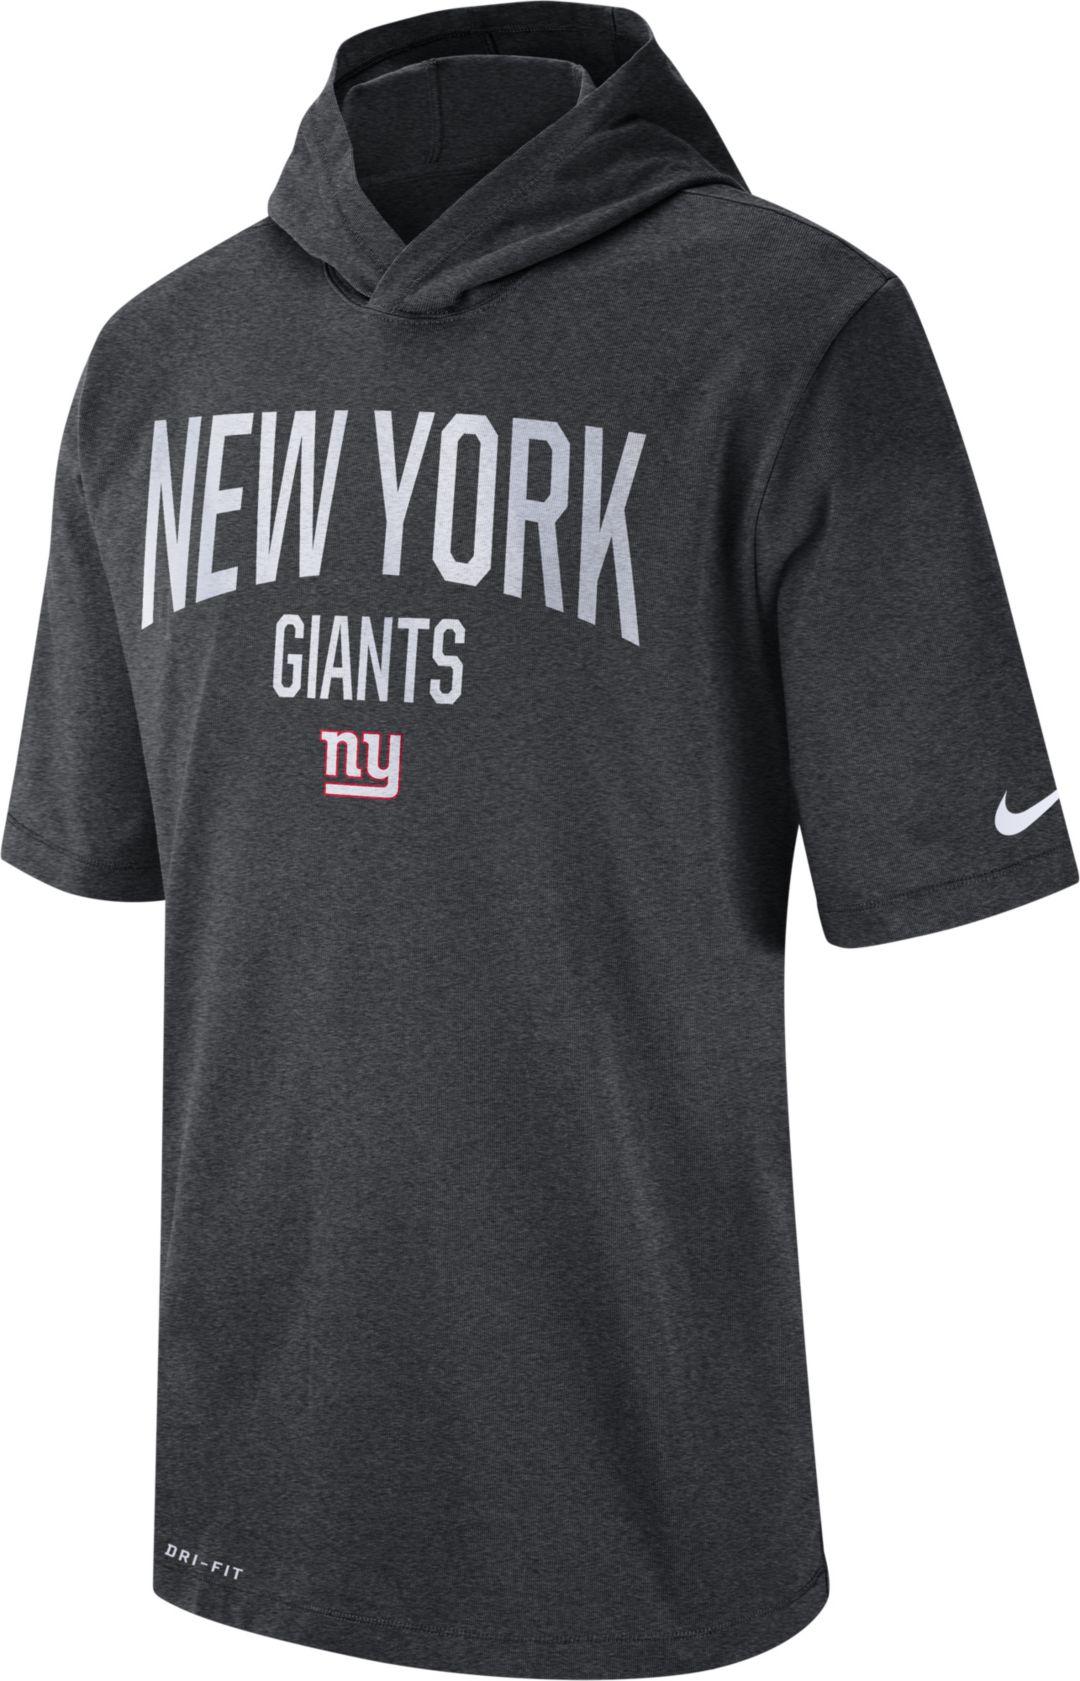 online retailer 5c8c0 ad407 Nike Men's New York Giants Sideline Charcoal Short-Sleeve ...